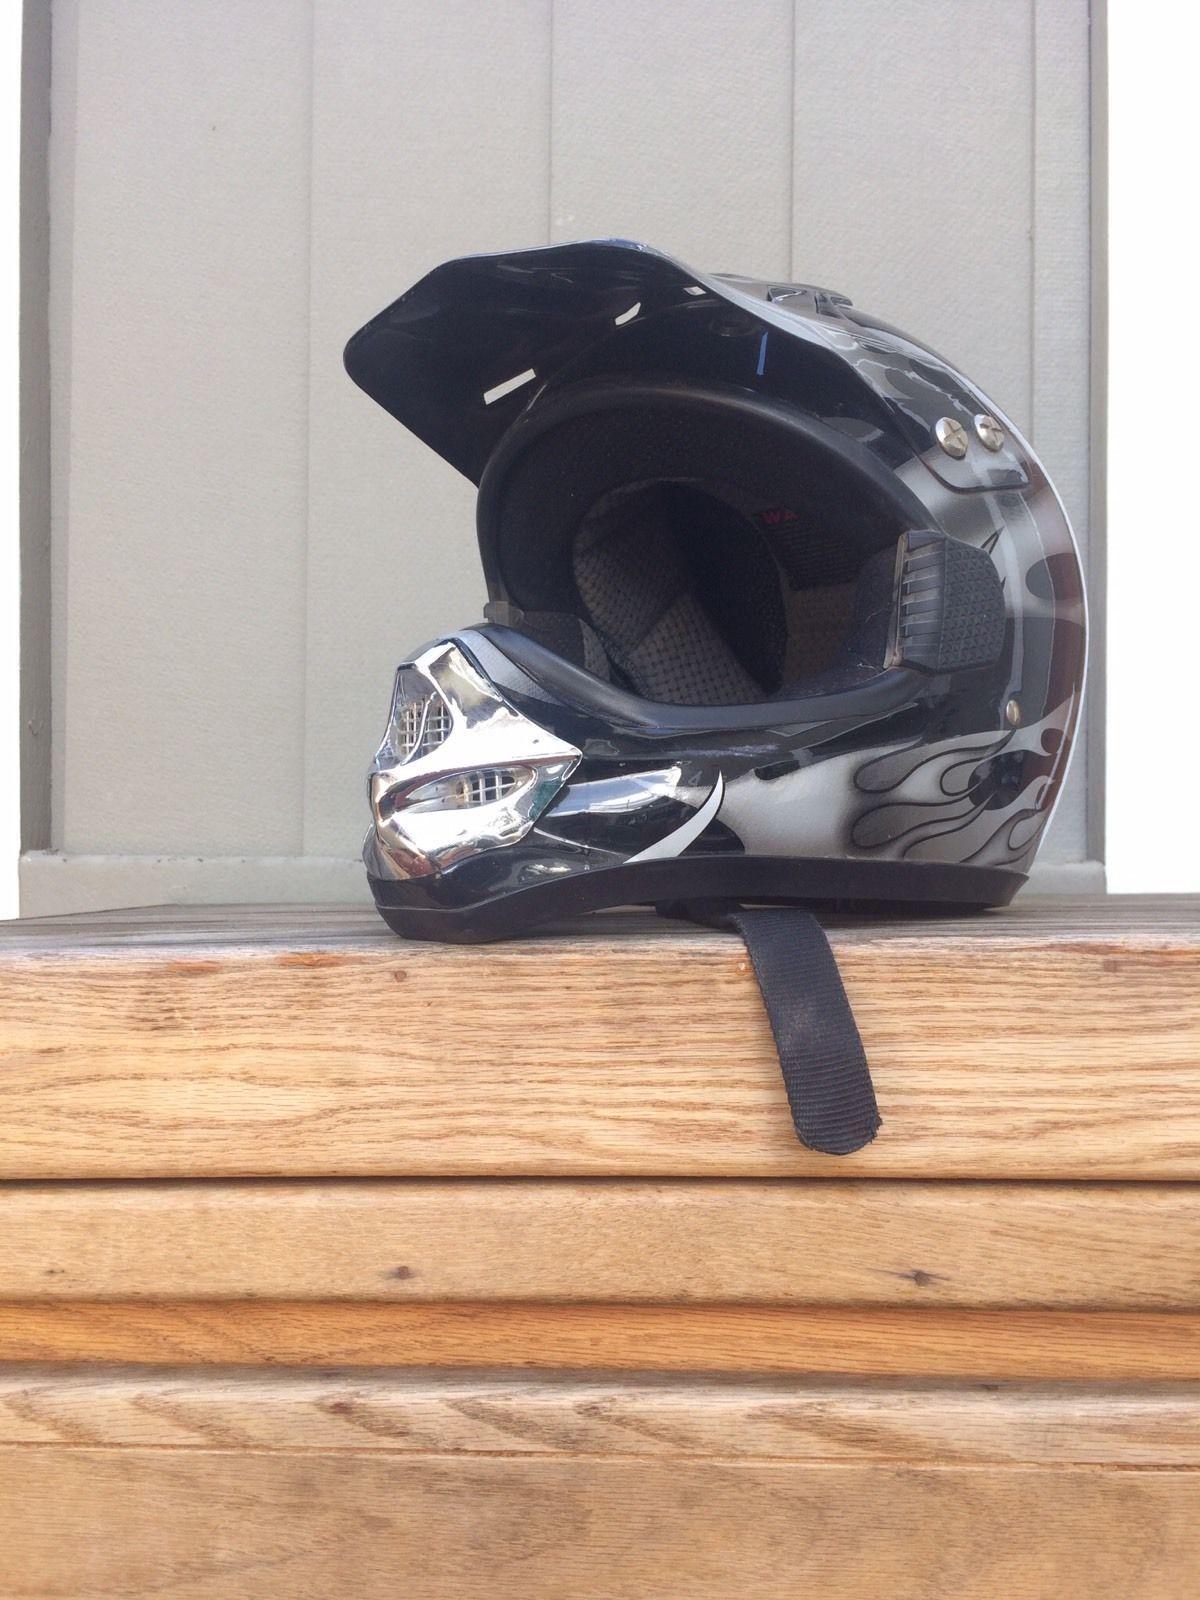 http motorcyclespareparts net teq dot large helmet in good